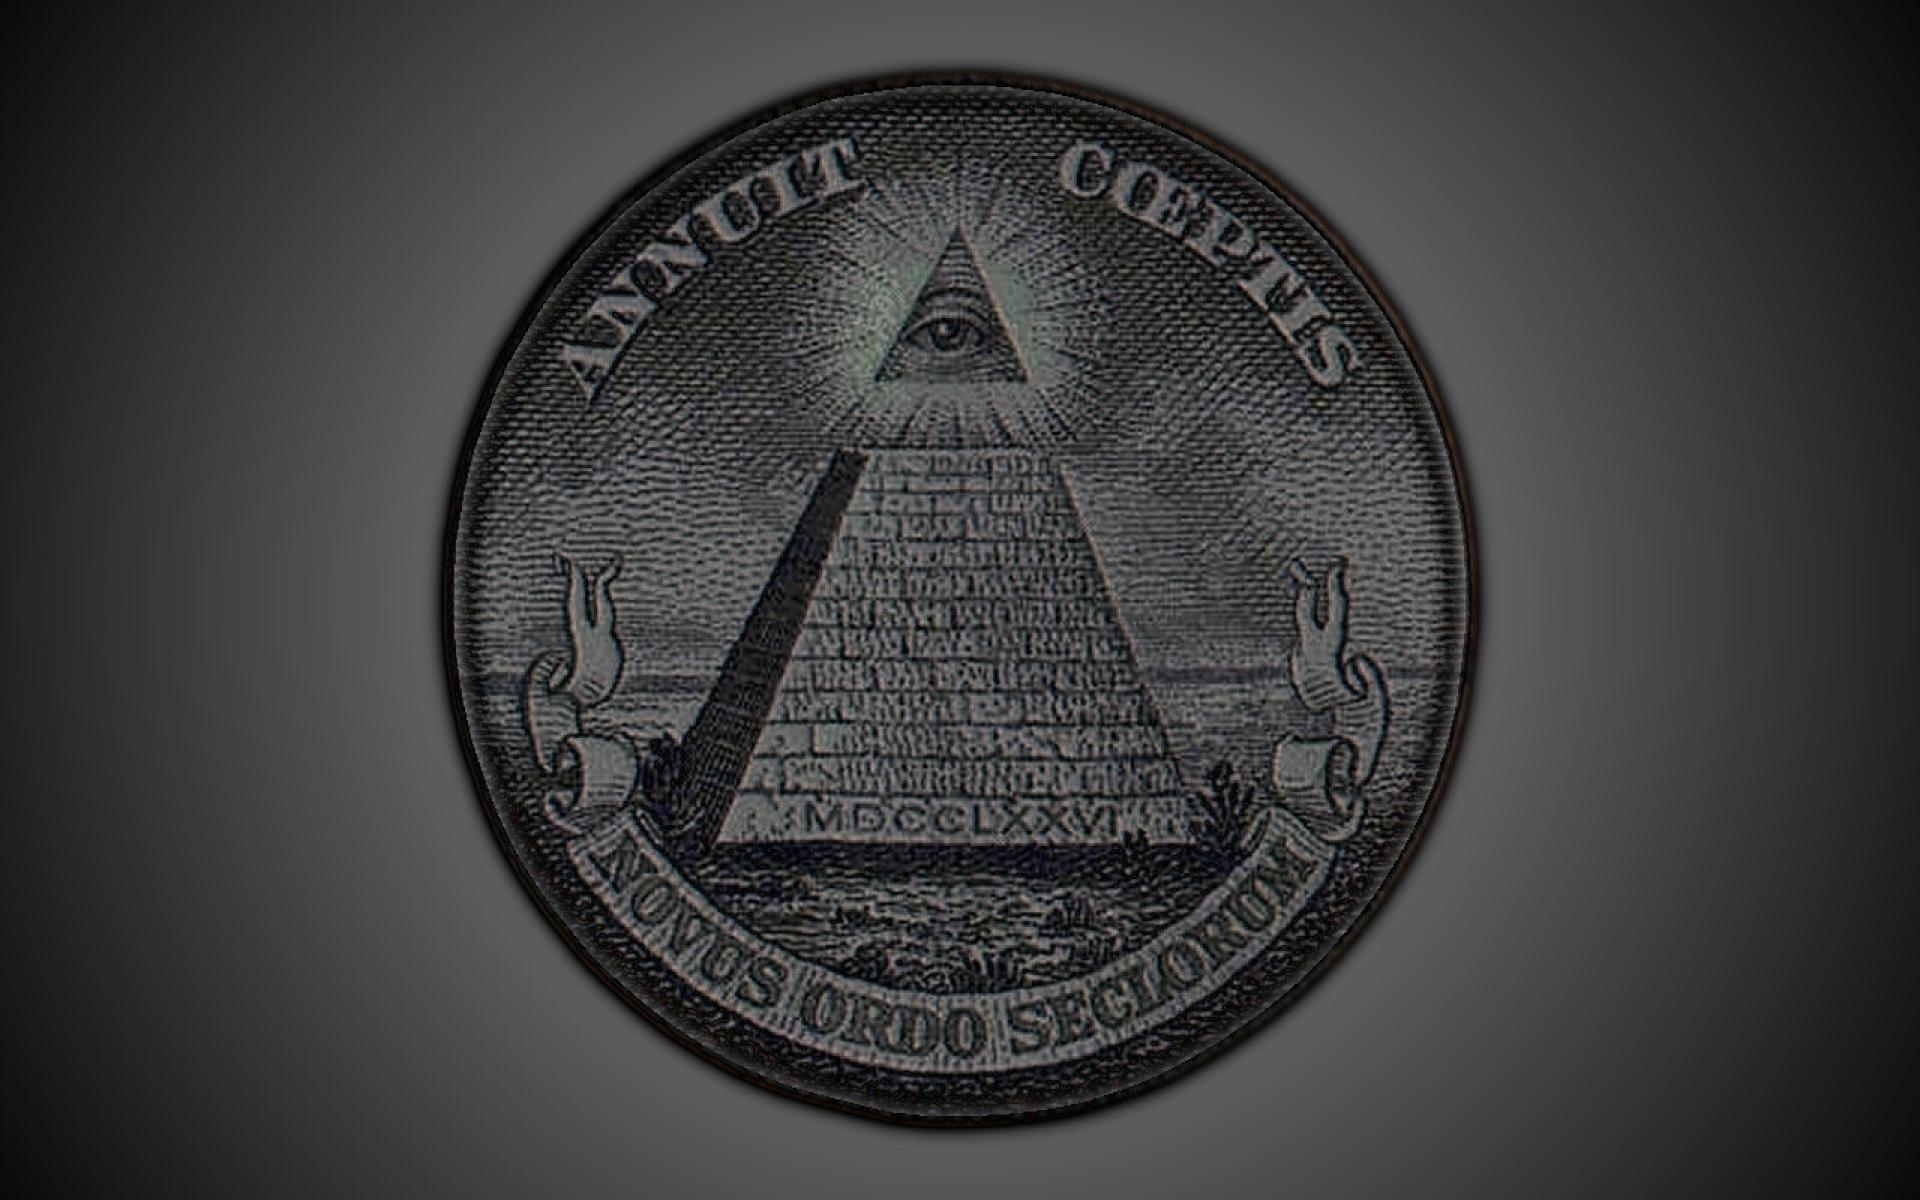 Lsd Wallpaper Iphone 6 Trippy Illuminati Wallpaper 58 Images